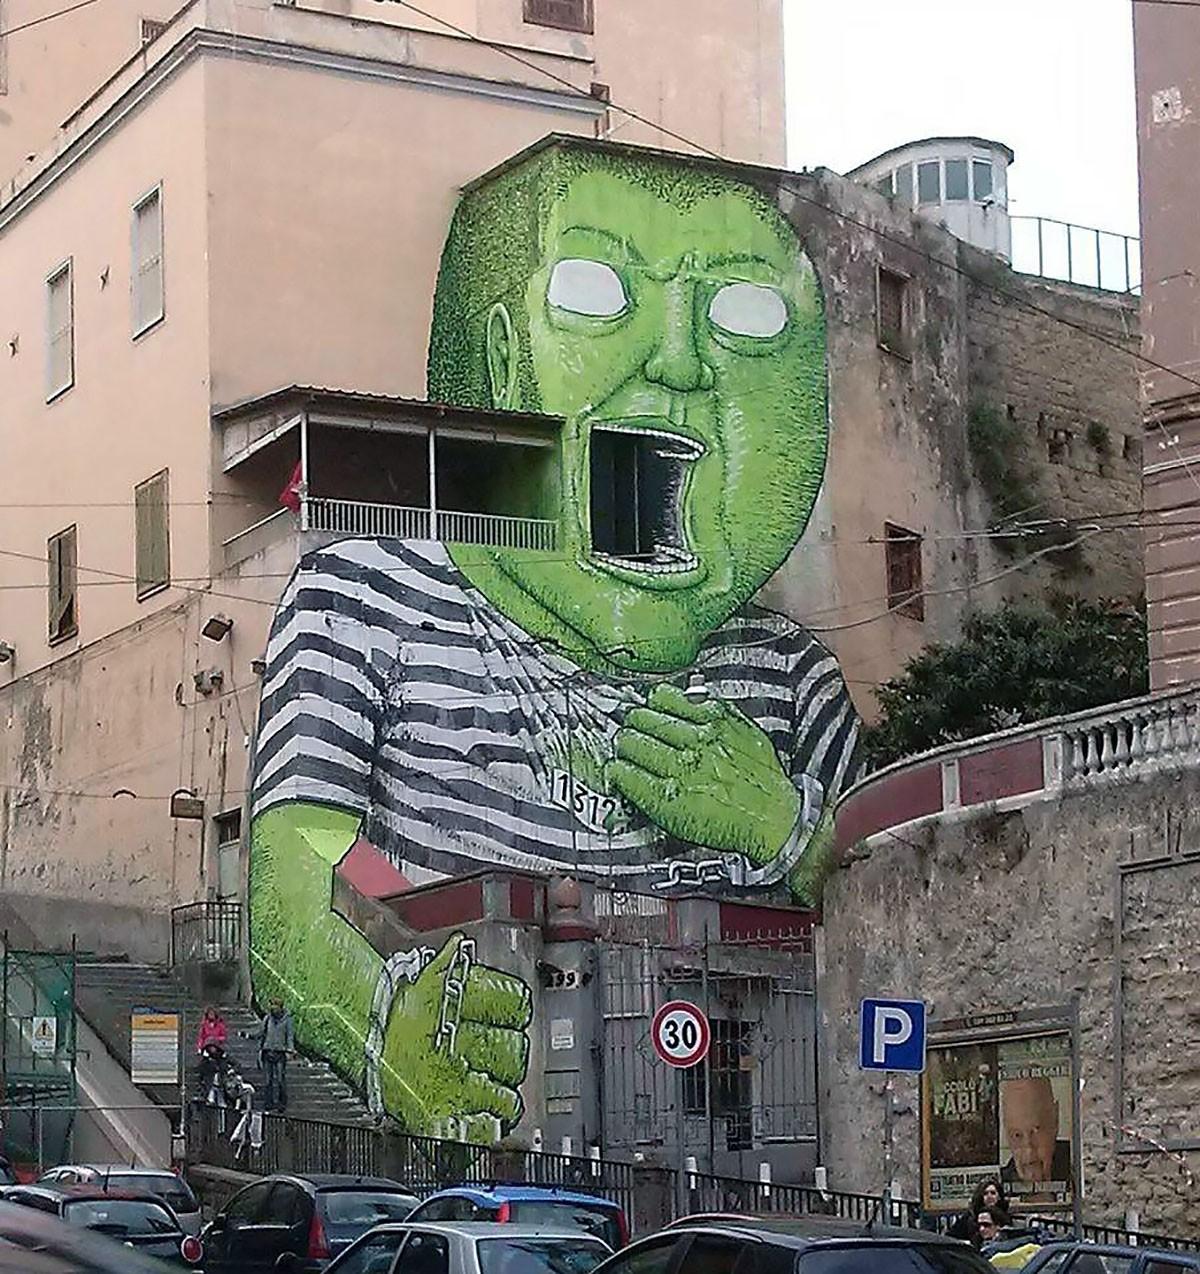 blu_napoli_streetartnews-4